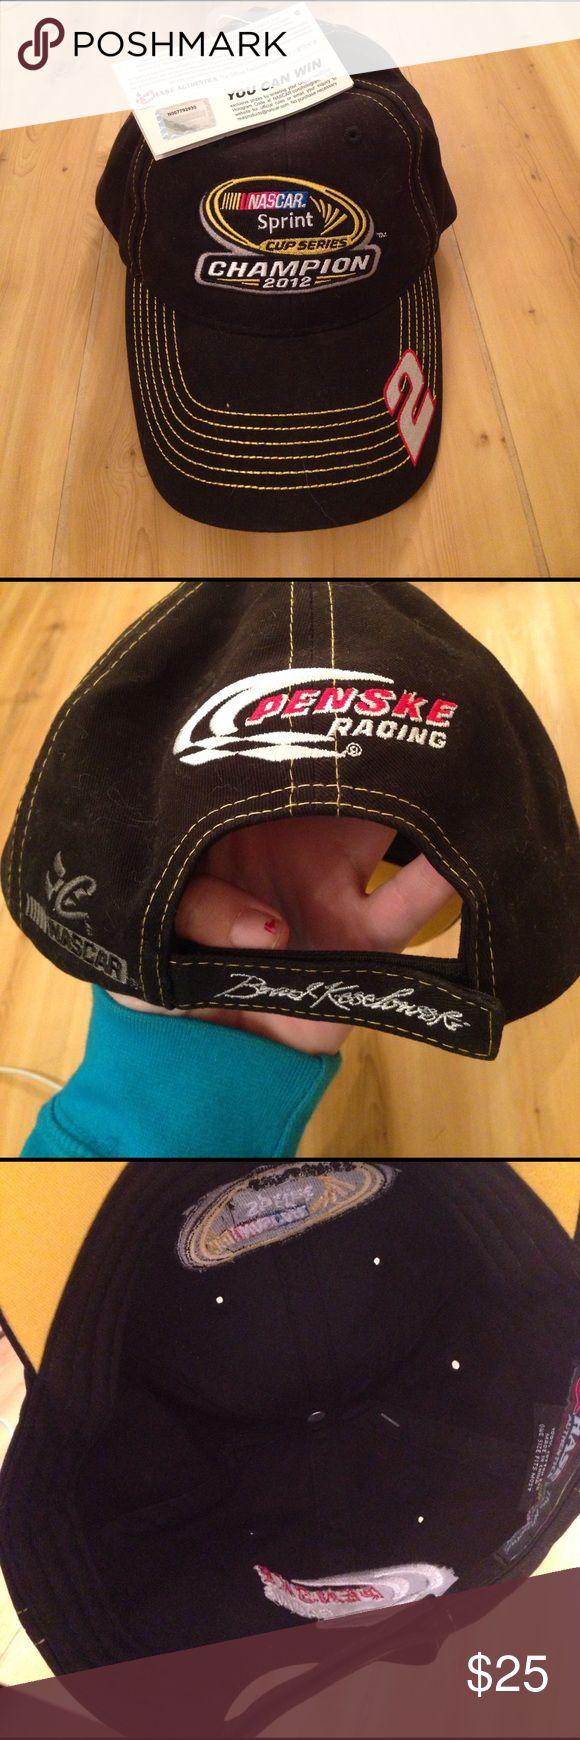 NASCAR Brad Keselowski #2 Hat NWT Brad Keselowski hat champion nascar sprint cup series 2012 NASCAR Accessories Hats